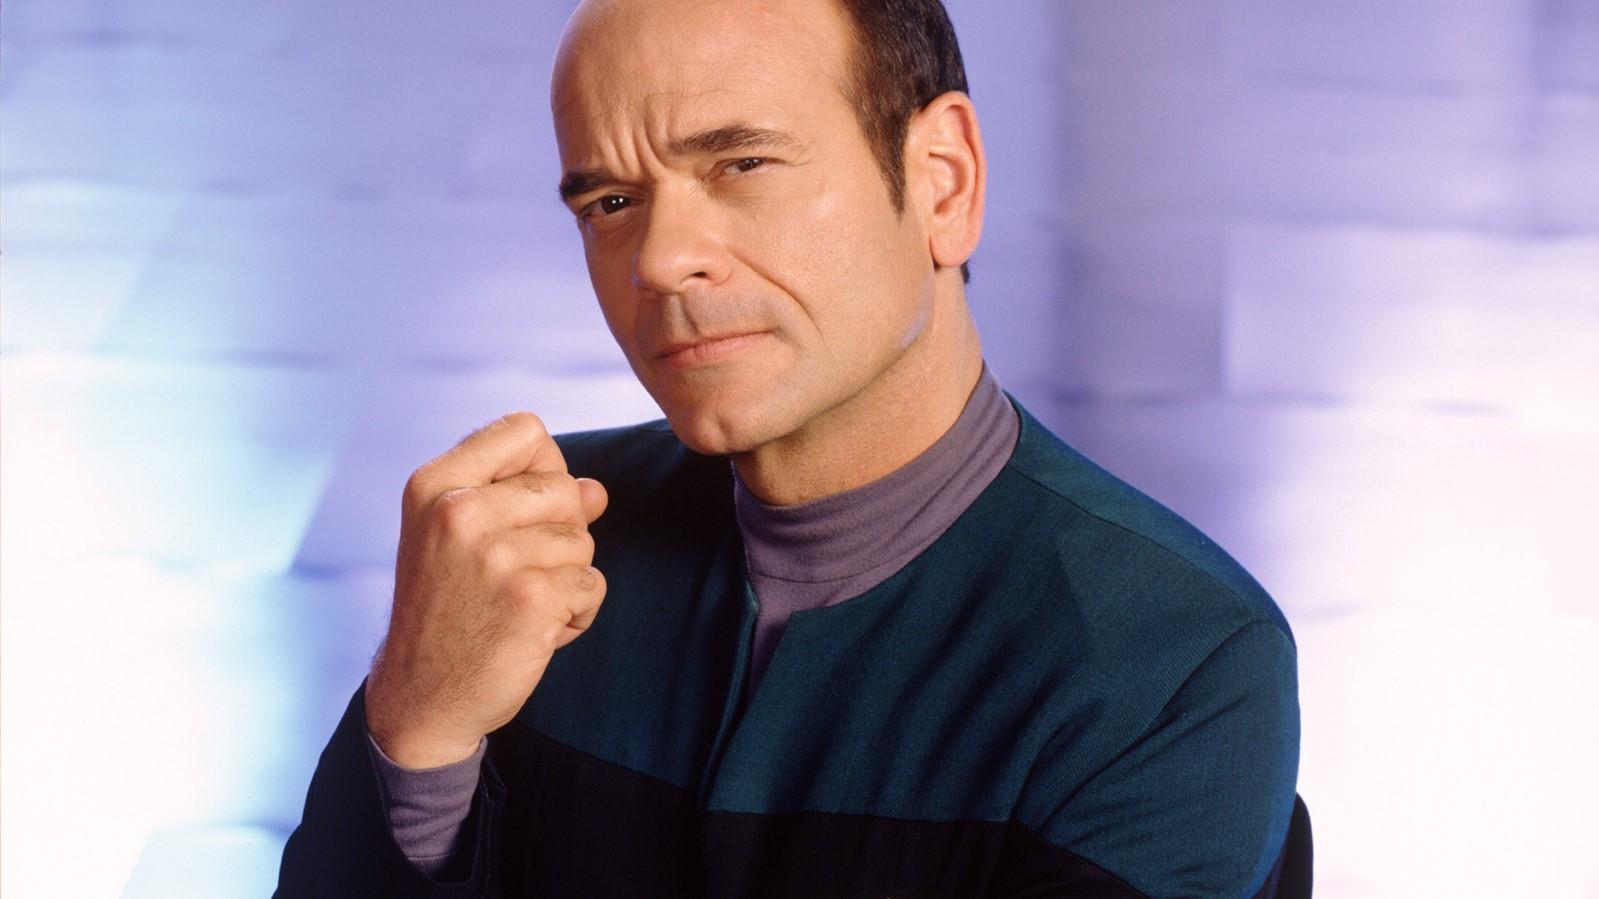 O Doutor - Voyager